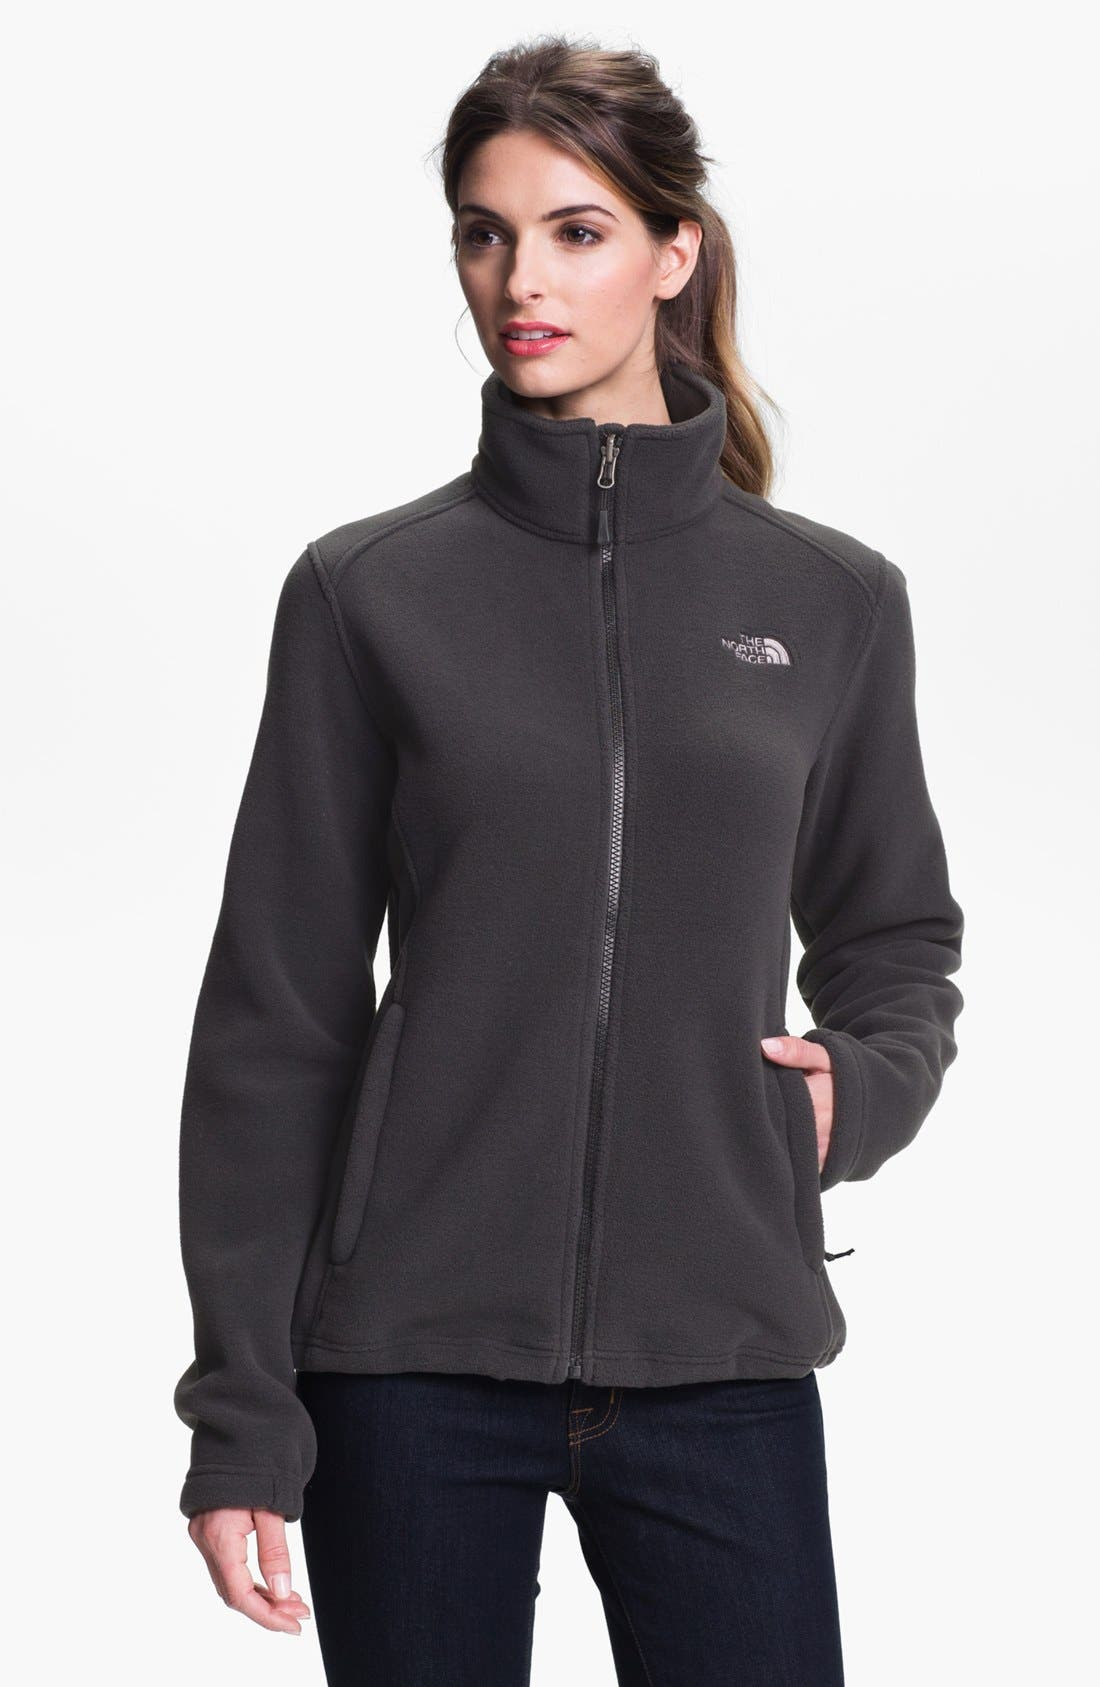 Main Image - The North Face 'RDT 300' Fleece Jacket